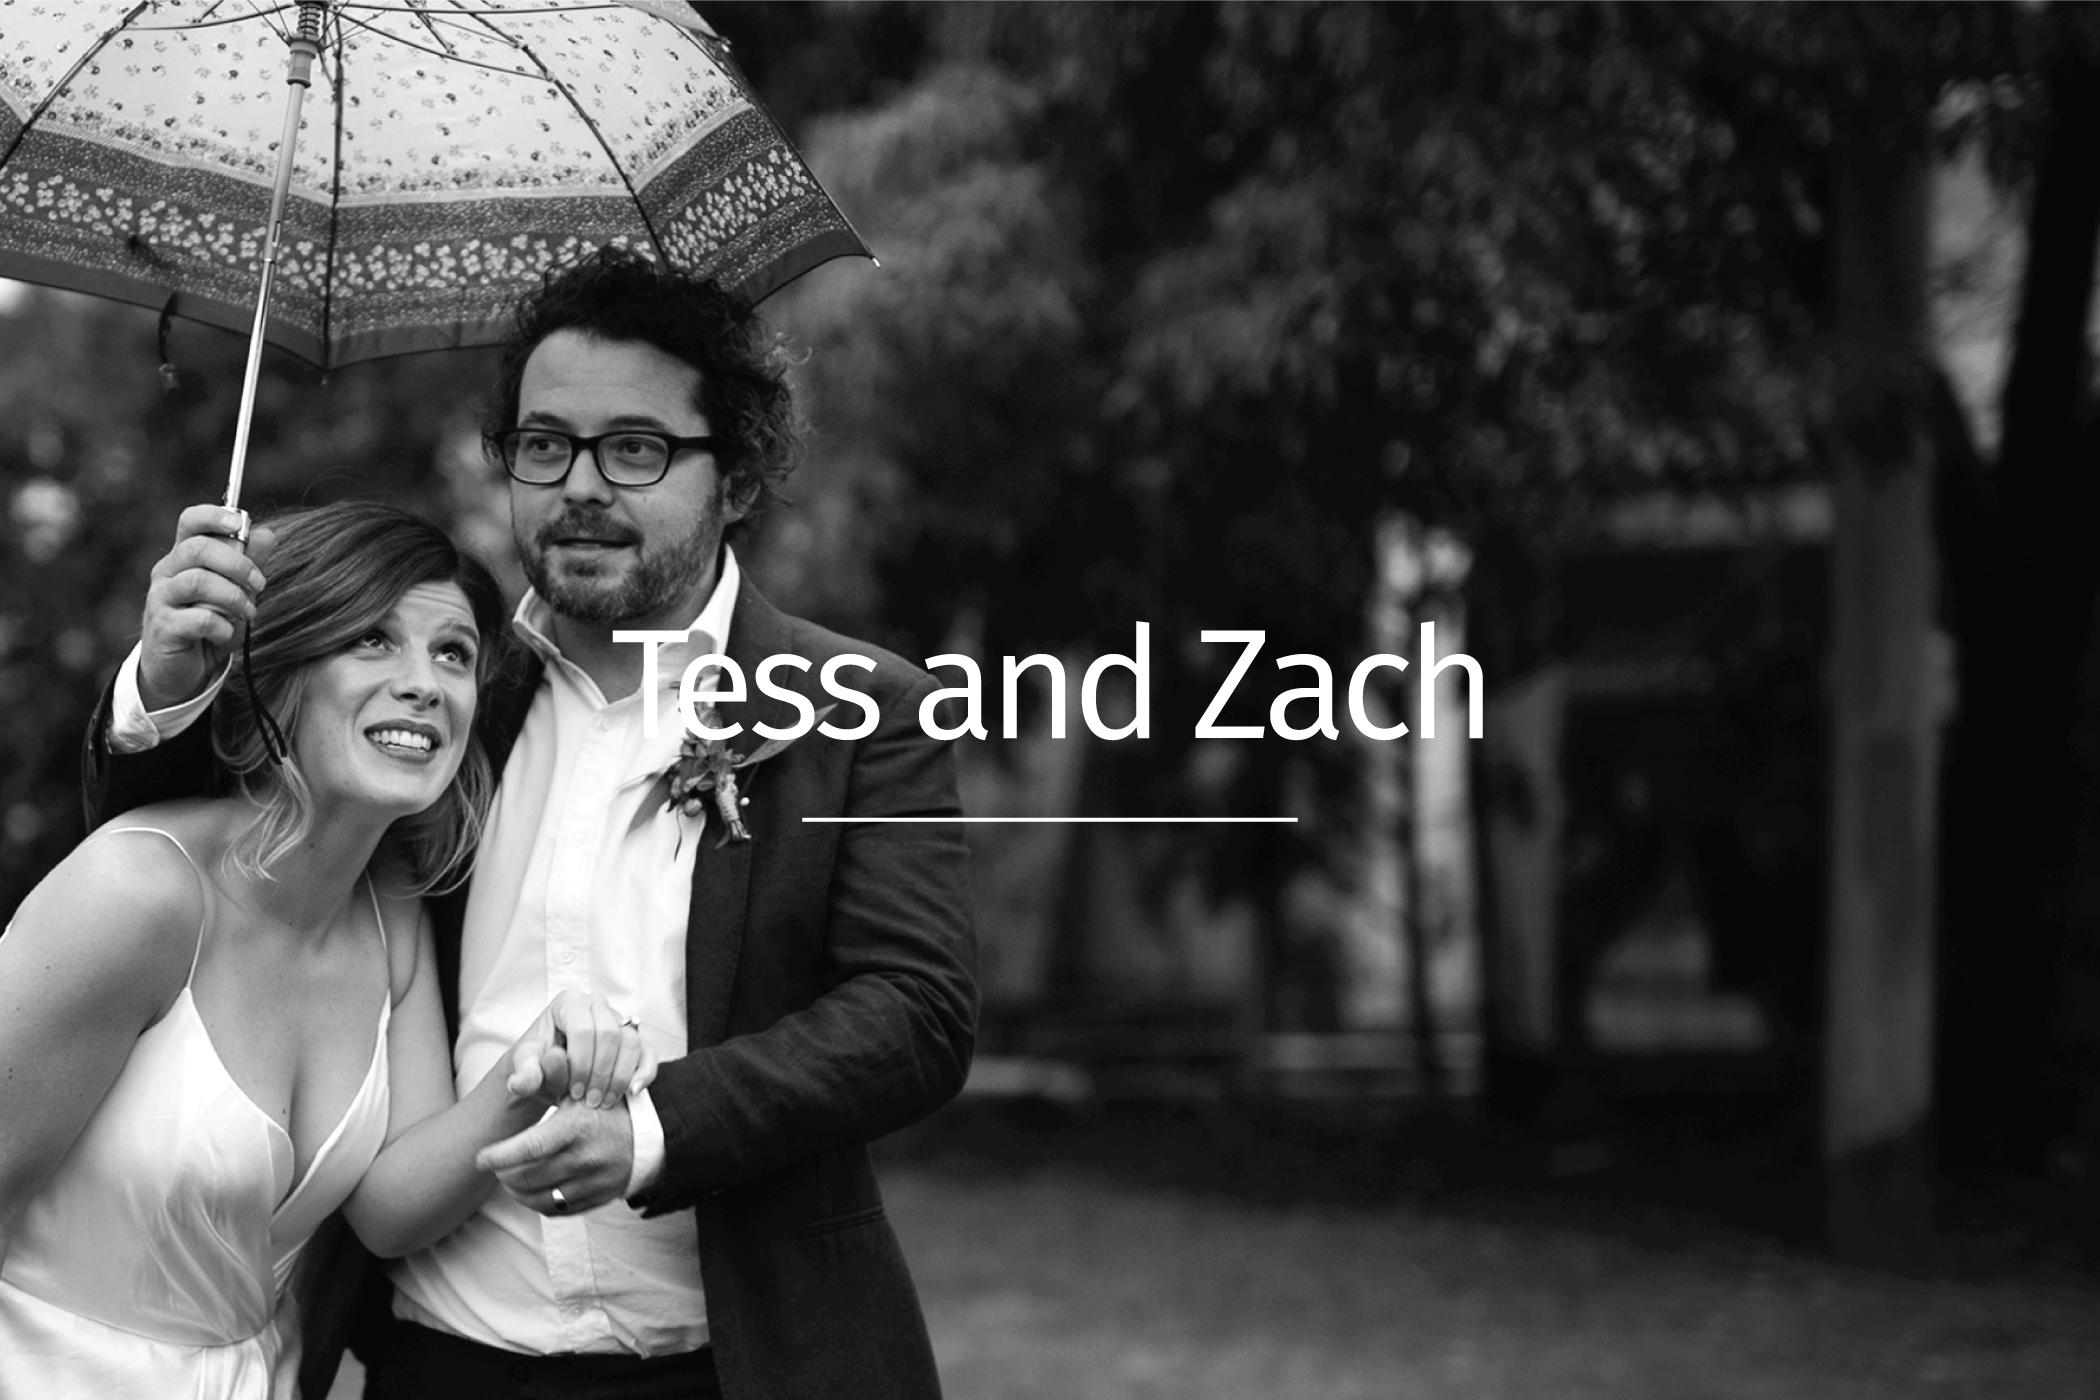 Tess-and-Zach-thumbnail.jpg